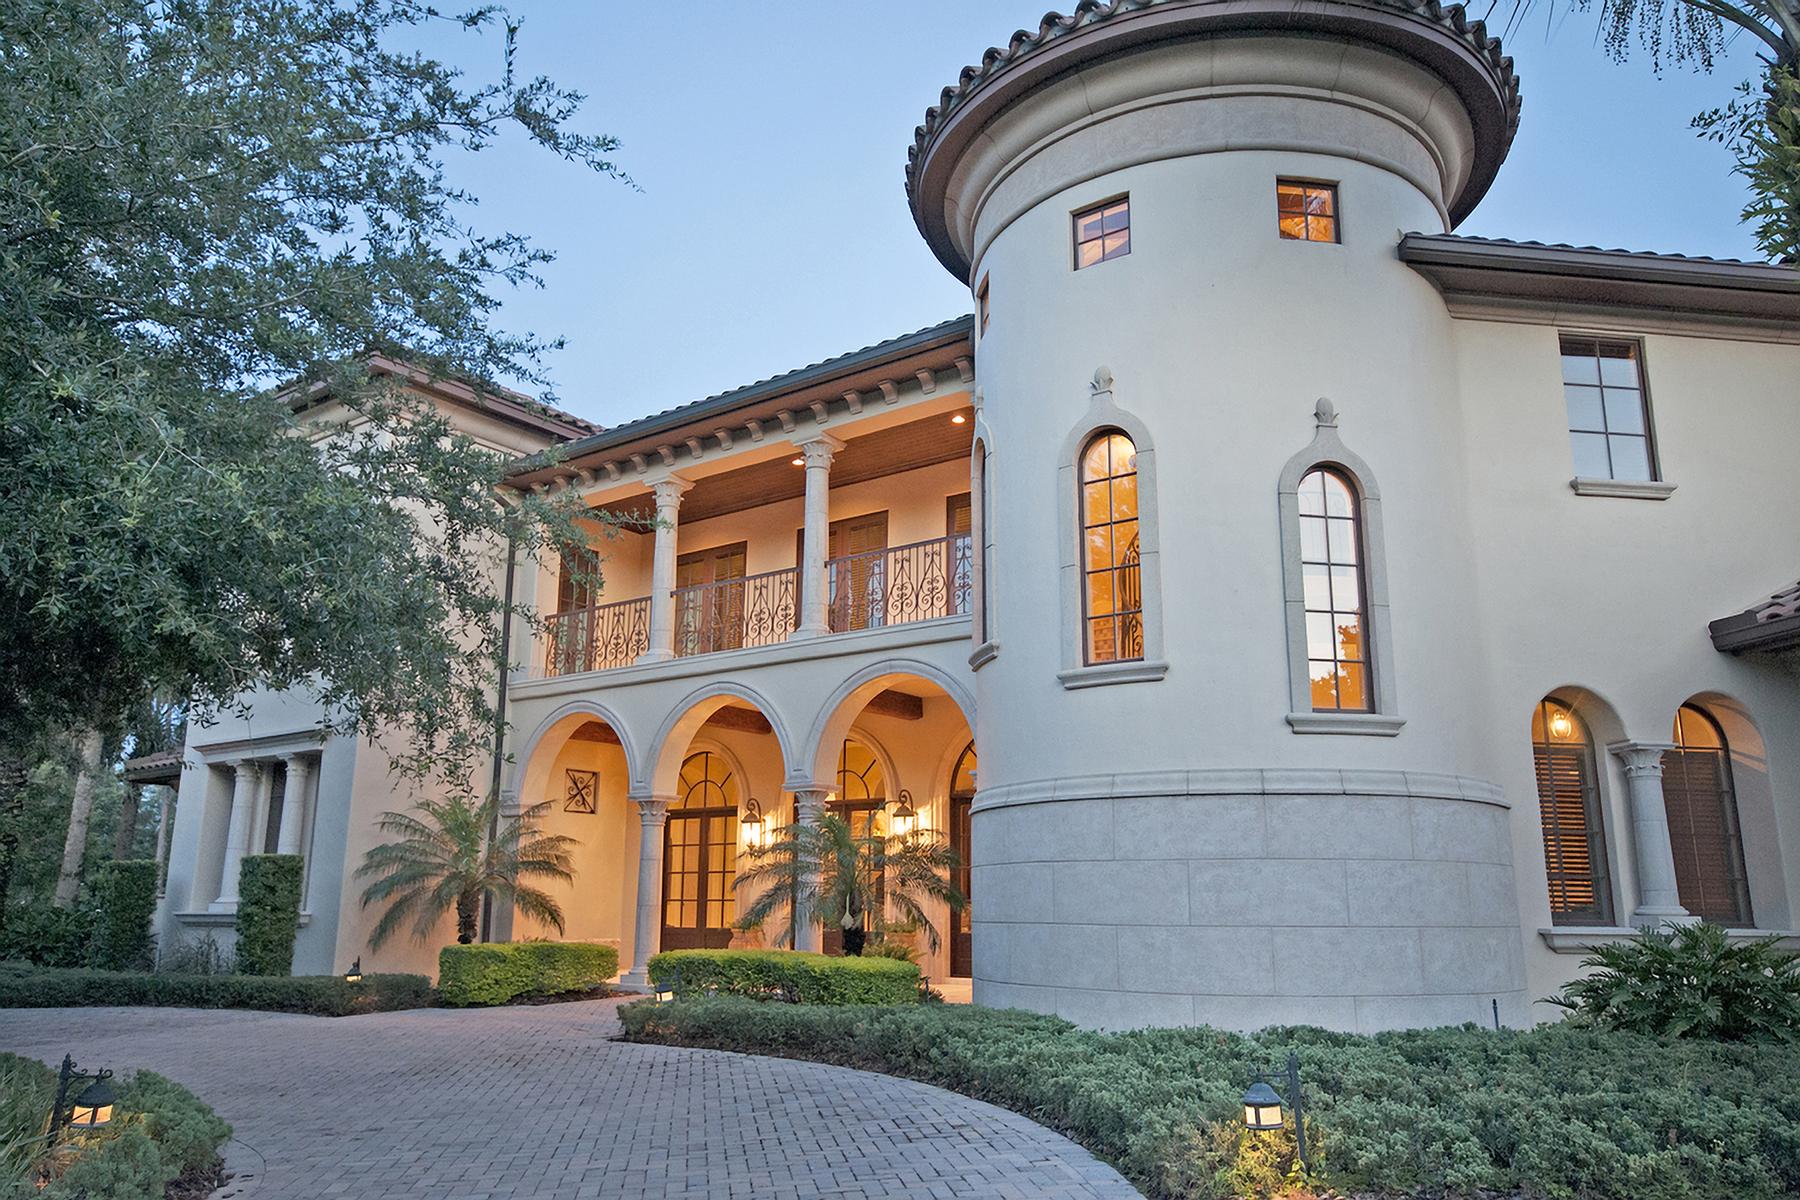 Single Family Home for Sale at LAKE NONA 9680 Sloane St Orlando, Florida, 32827 United States